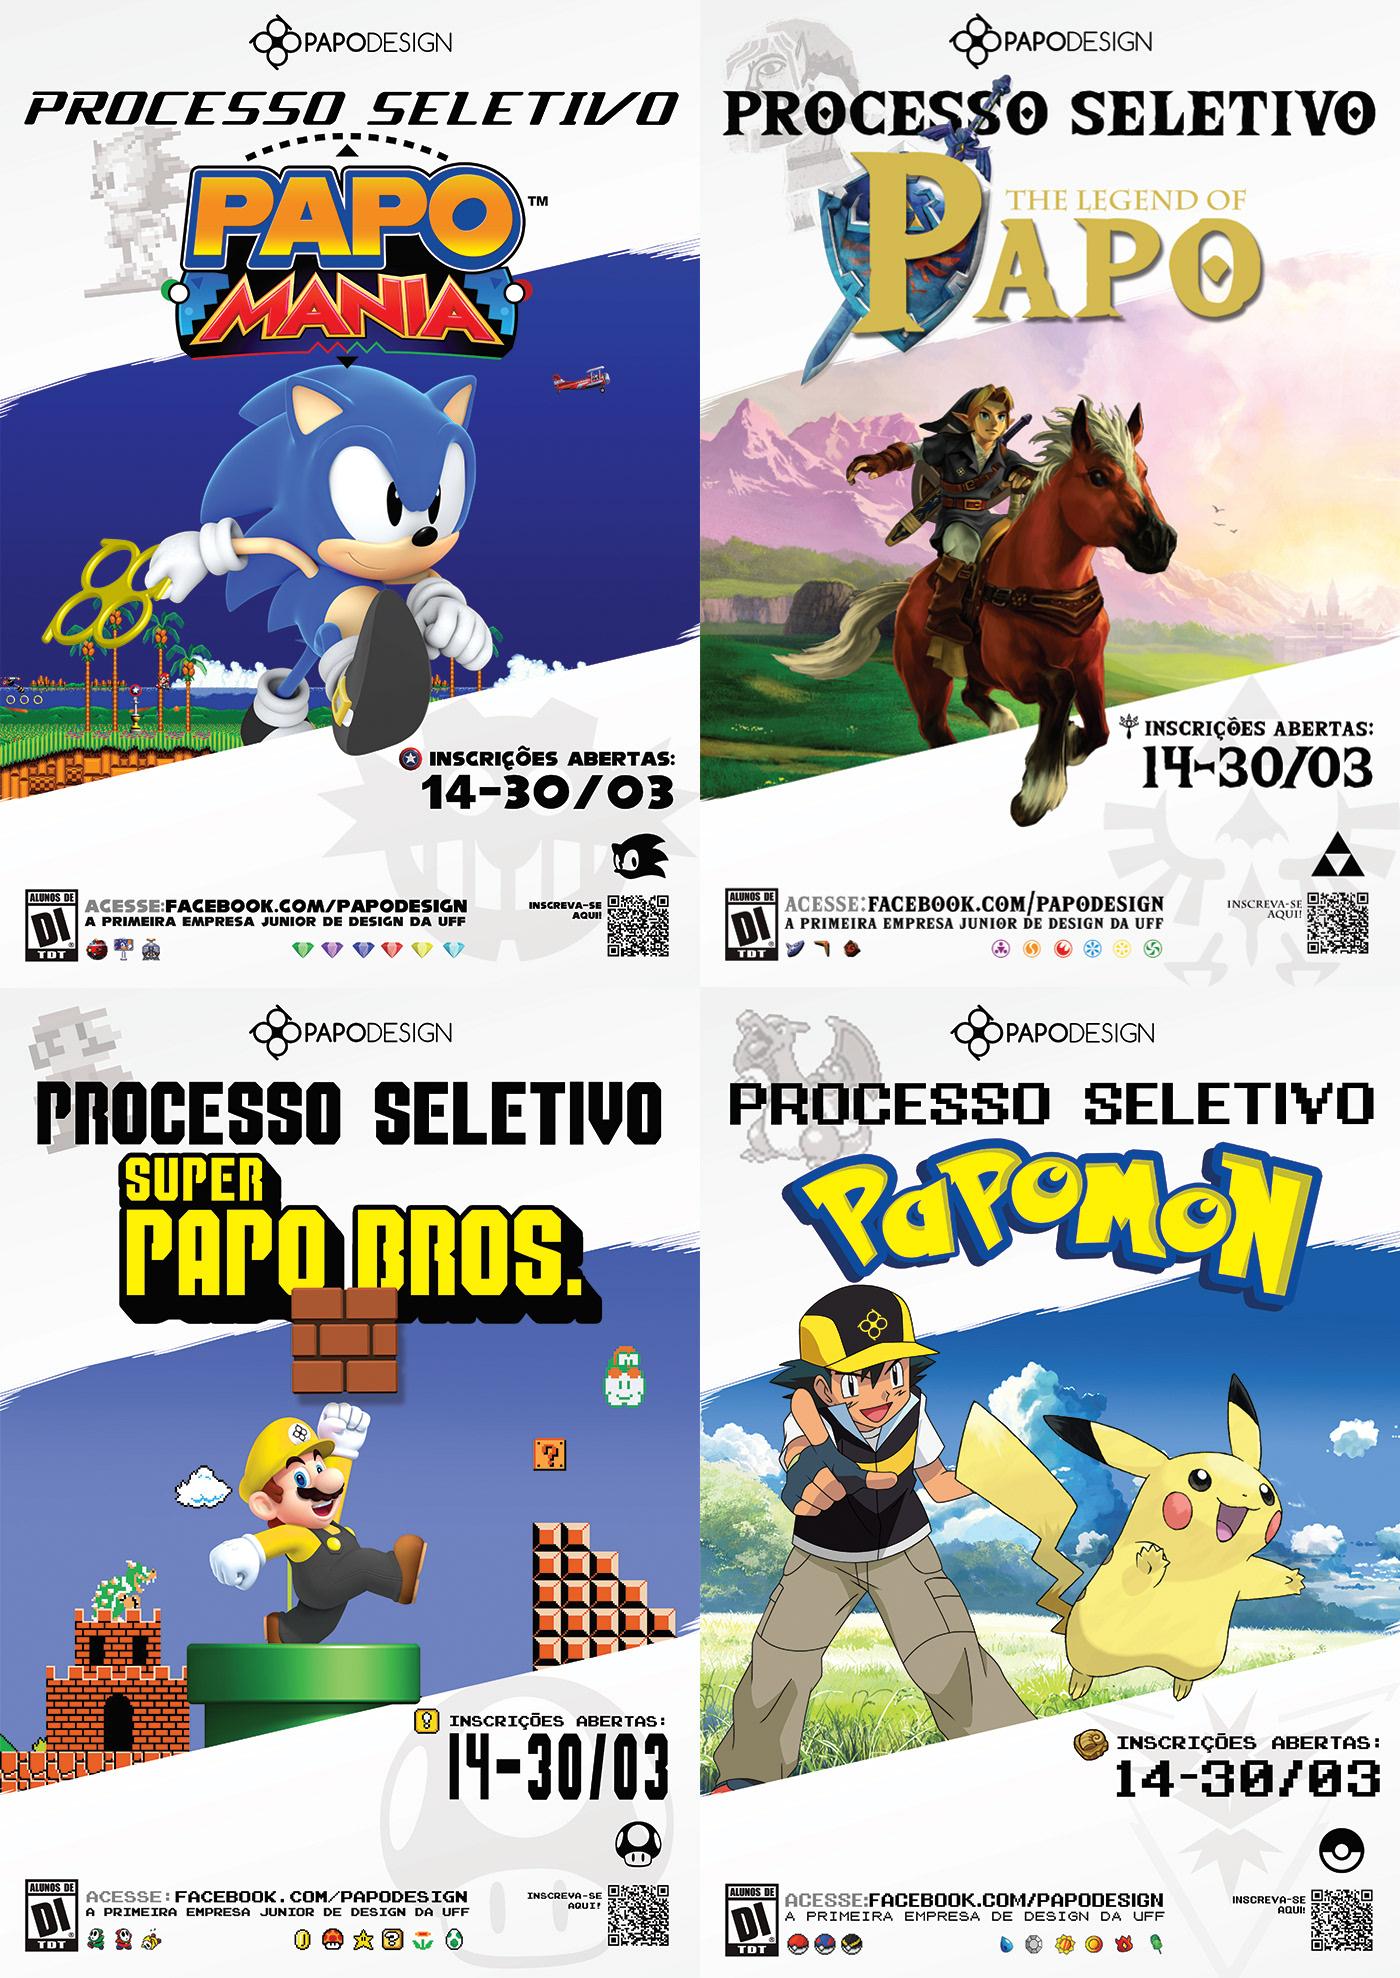 Papo Design Videogames Processo Seletivo gamefication empresa júnior marketing   Video Editing UFF Games gif